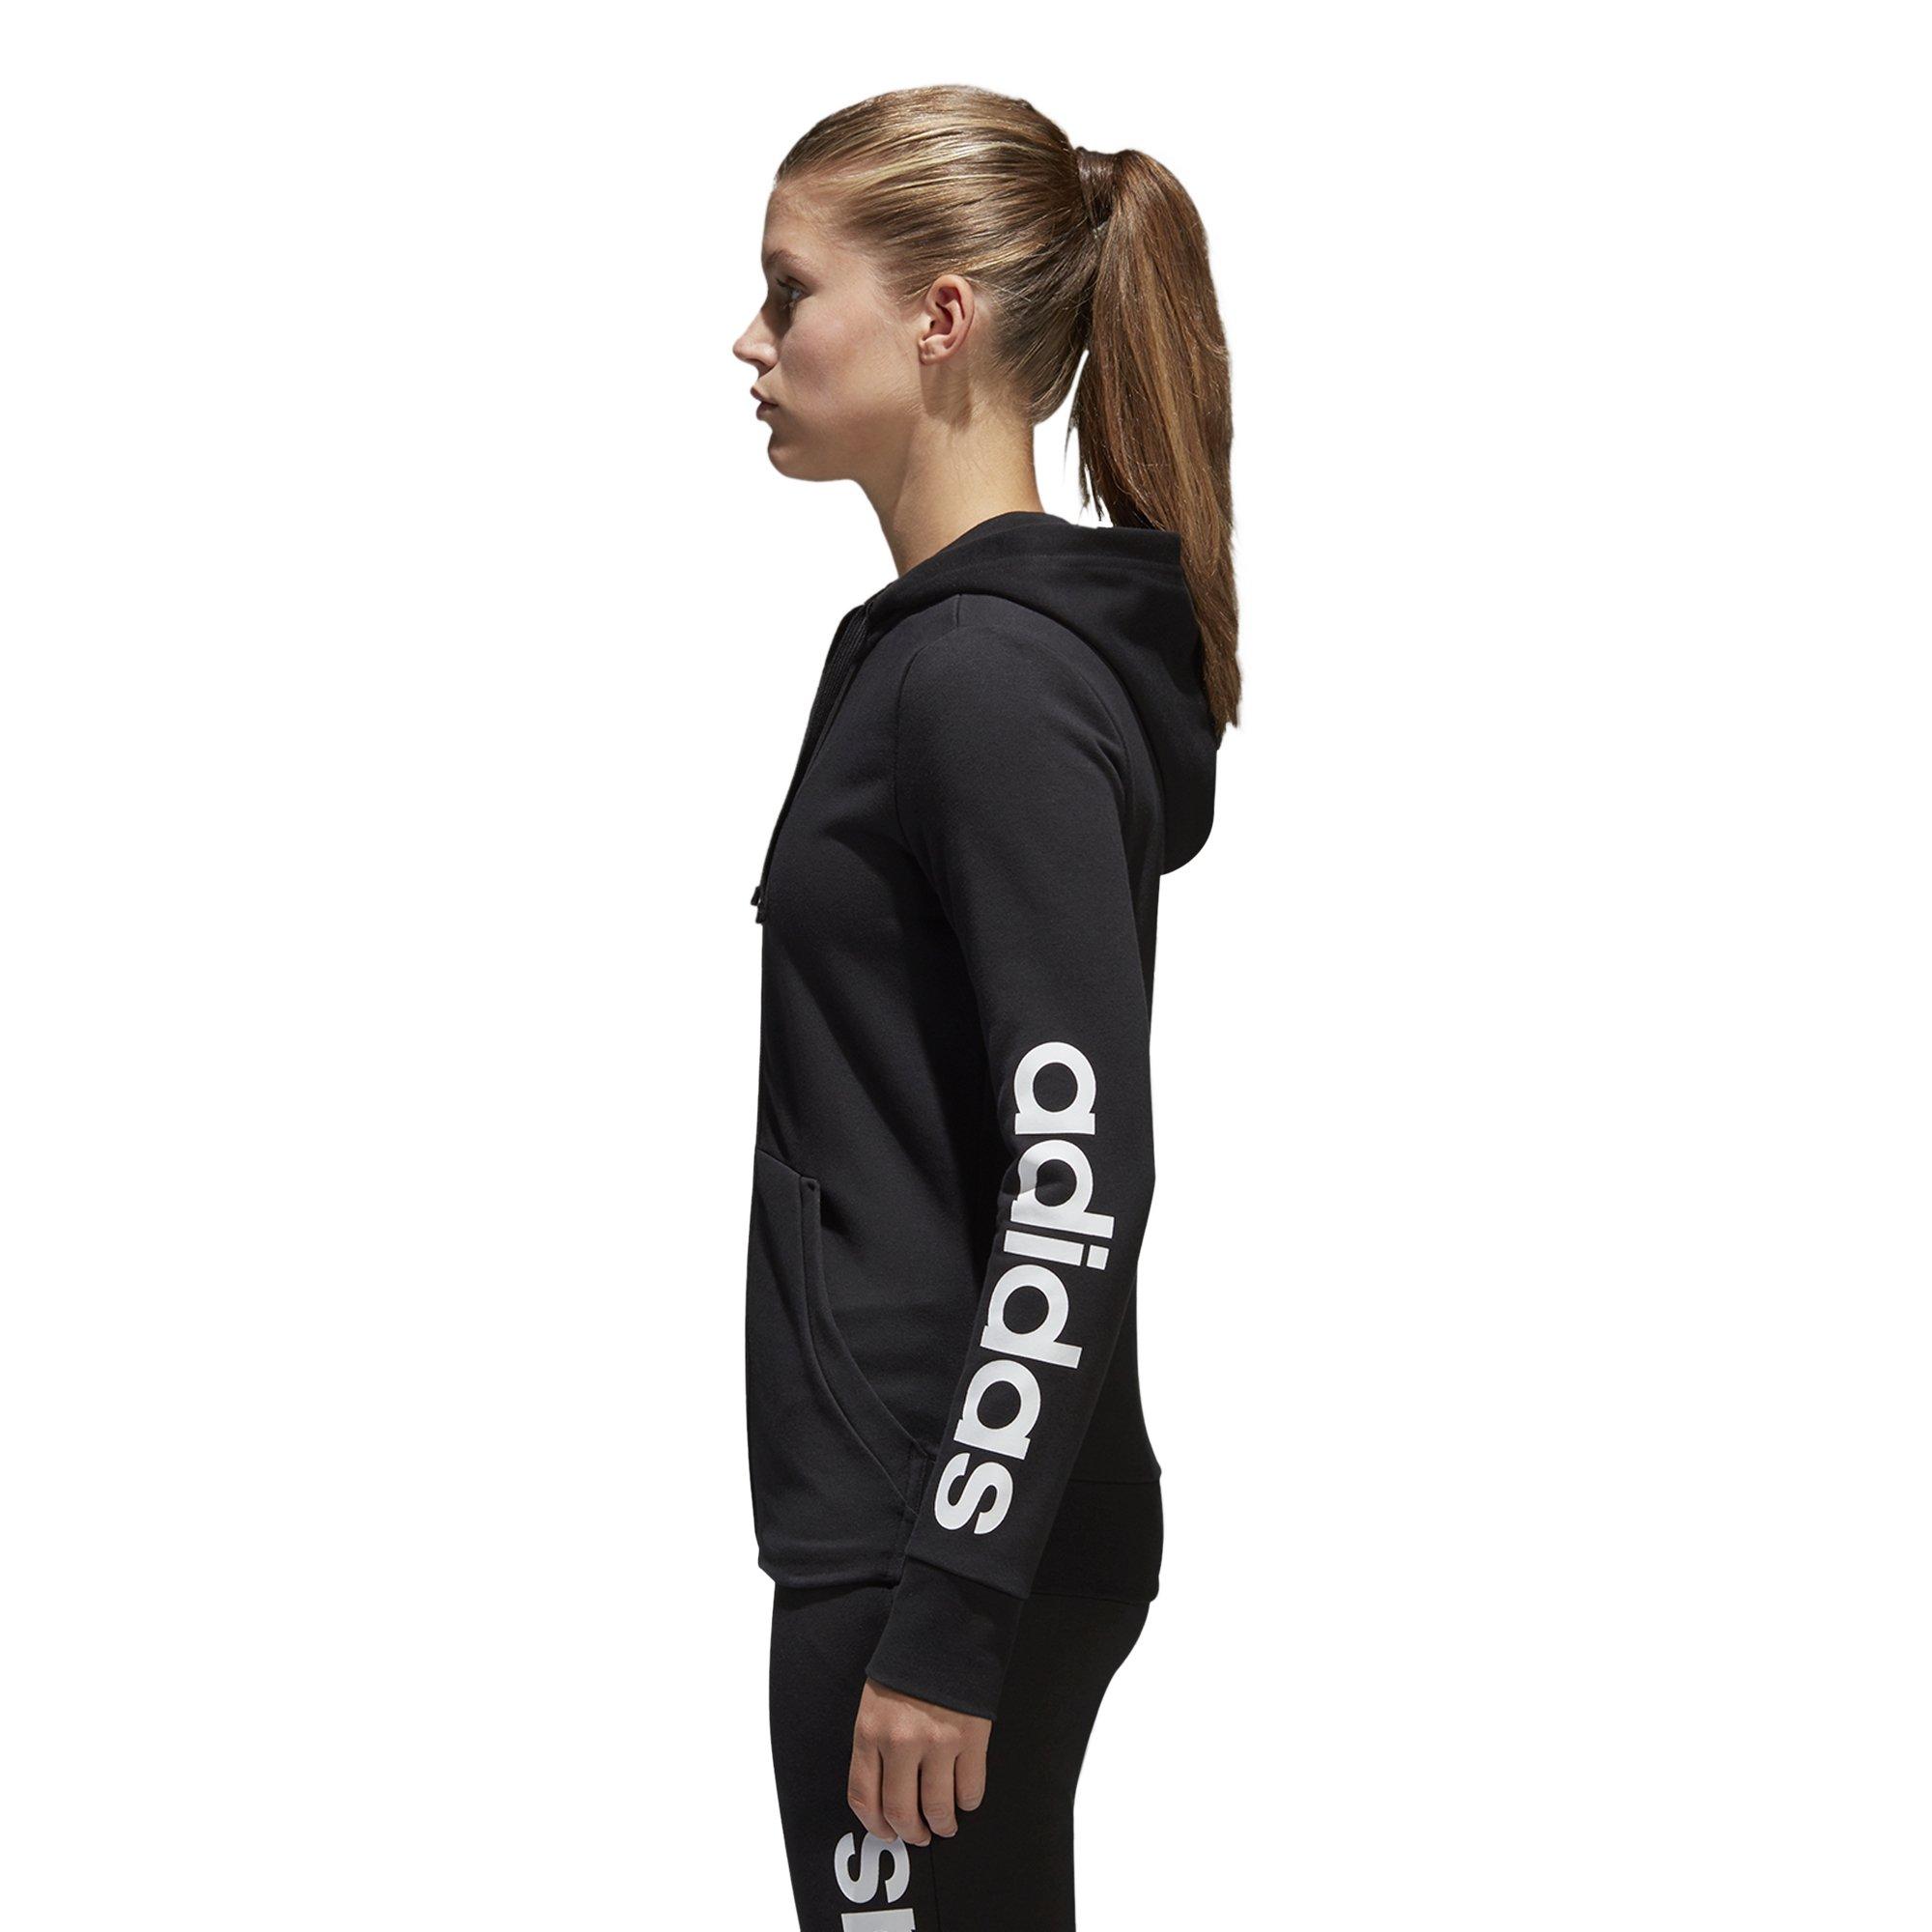 adidas Women's Essentials Linear Full Zip Fleece Hoodie, Black/White, X-Small by adidas (Image #3)